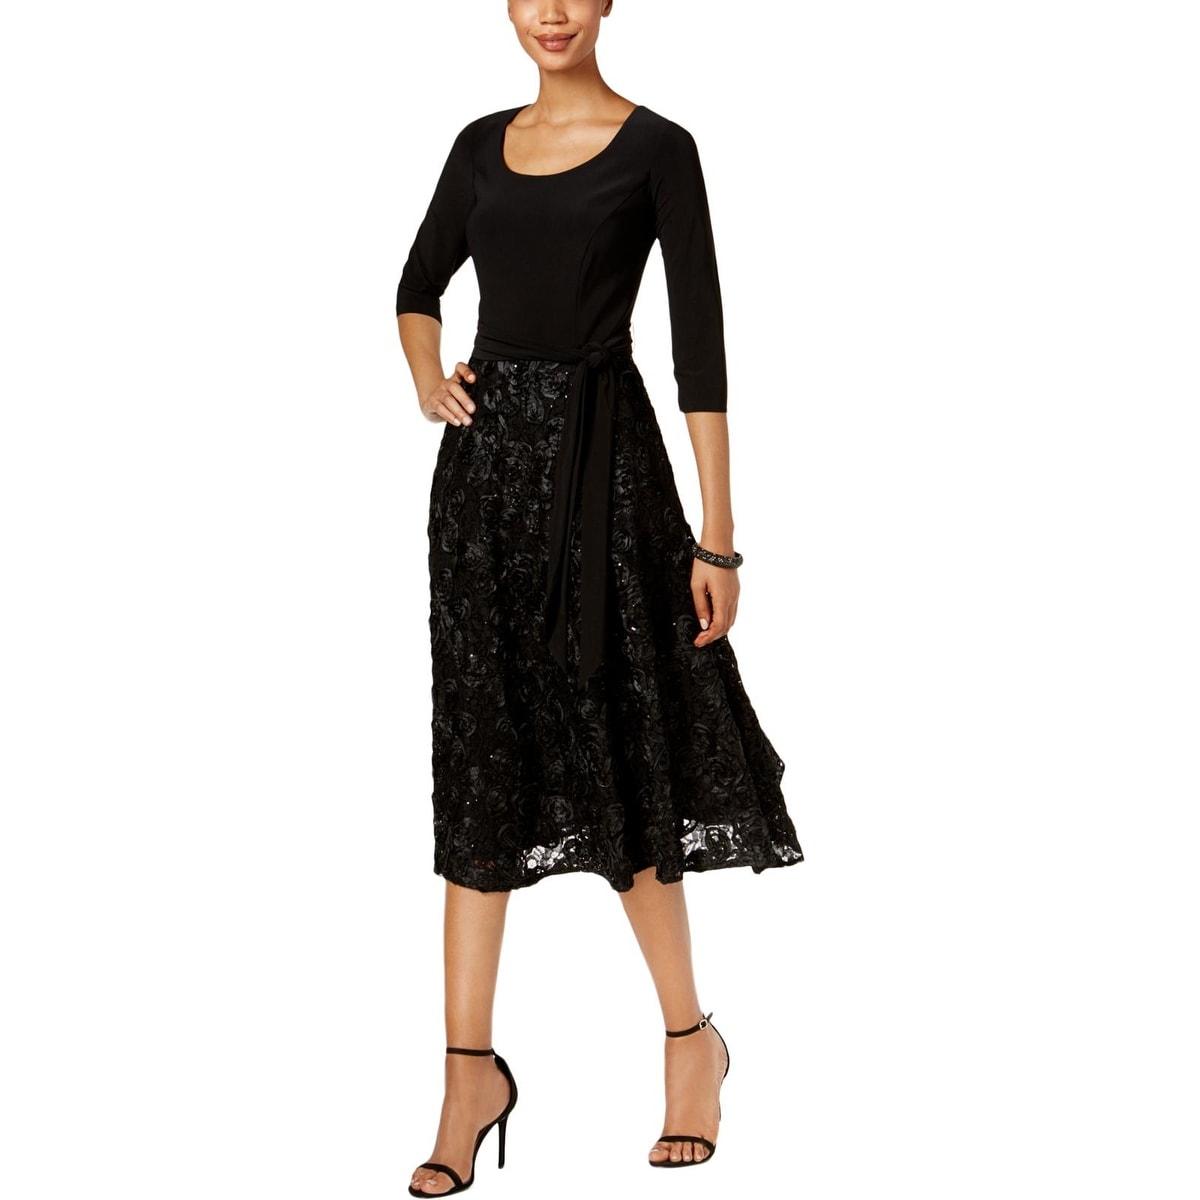 7eb94a40f0 Alex Evenings Women s Clothing